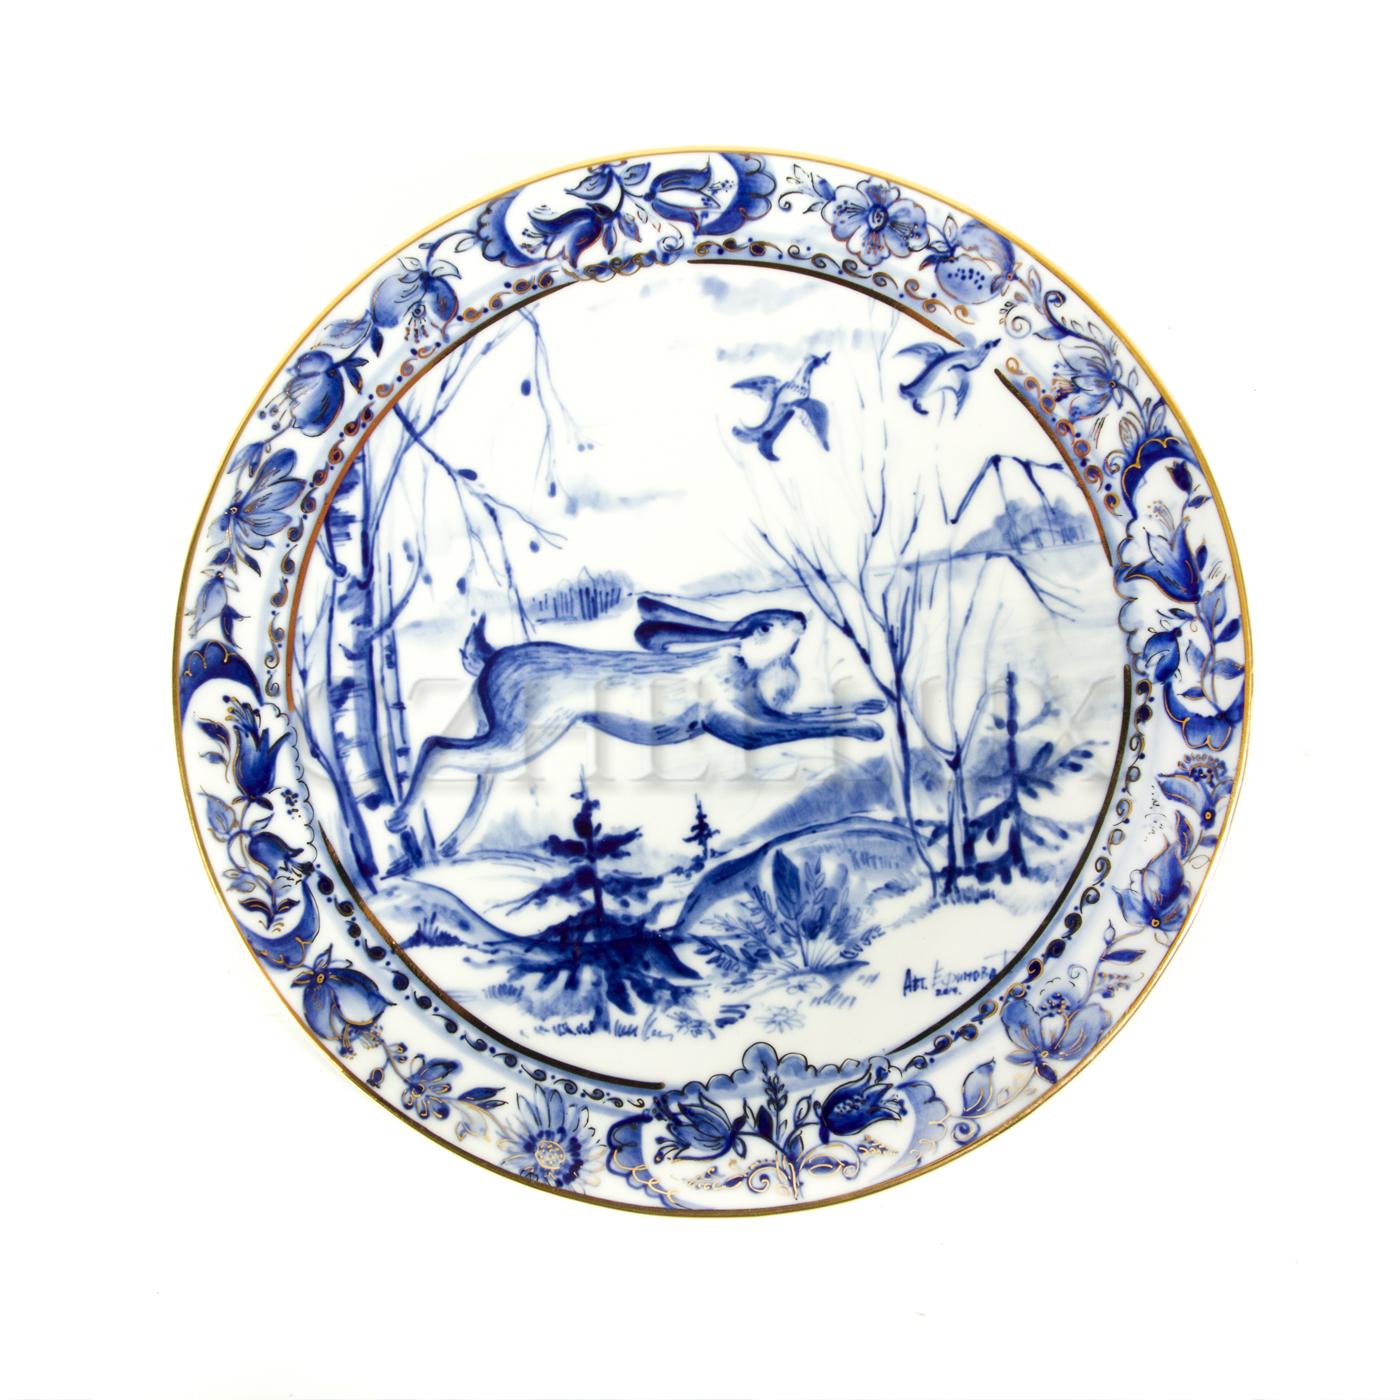 Тарелка декоративная «Заяц» в золоте